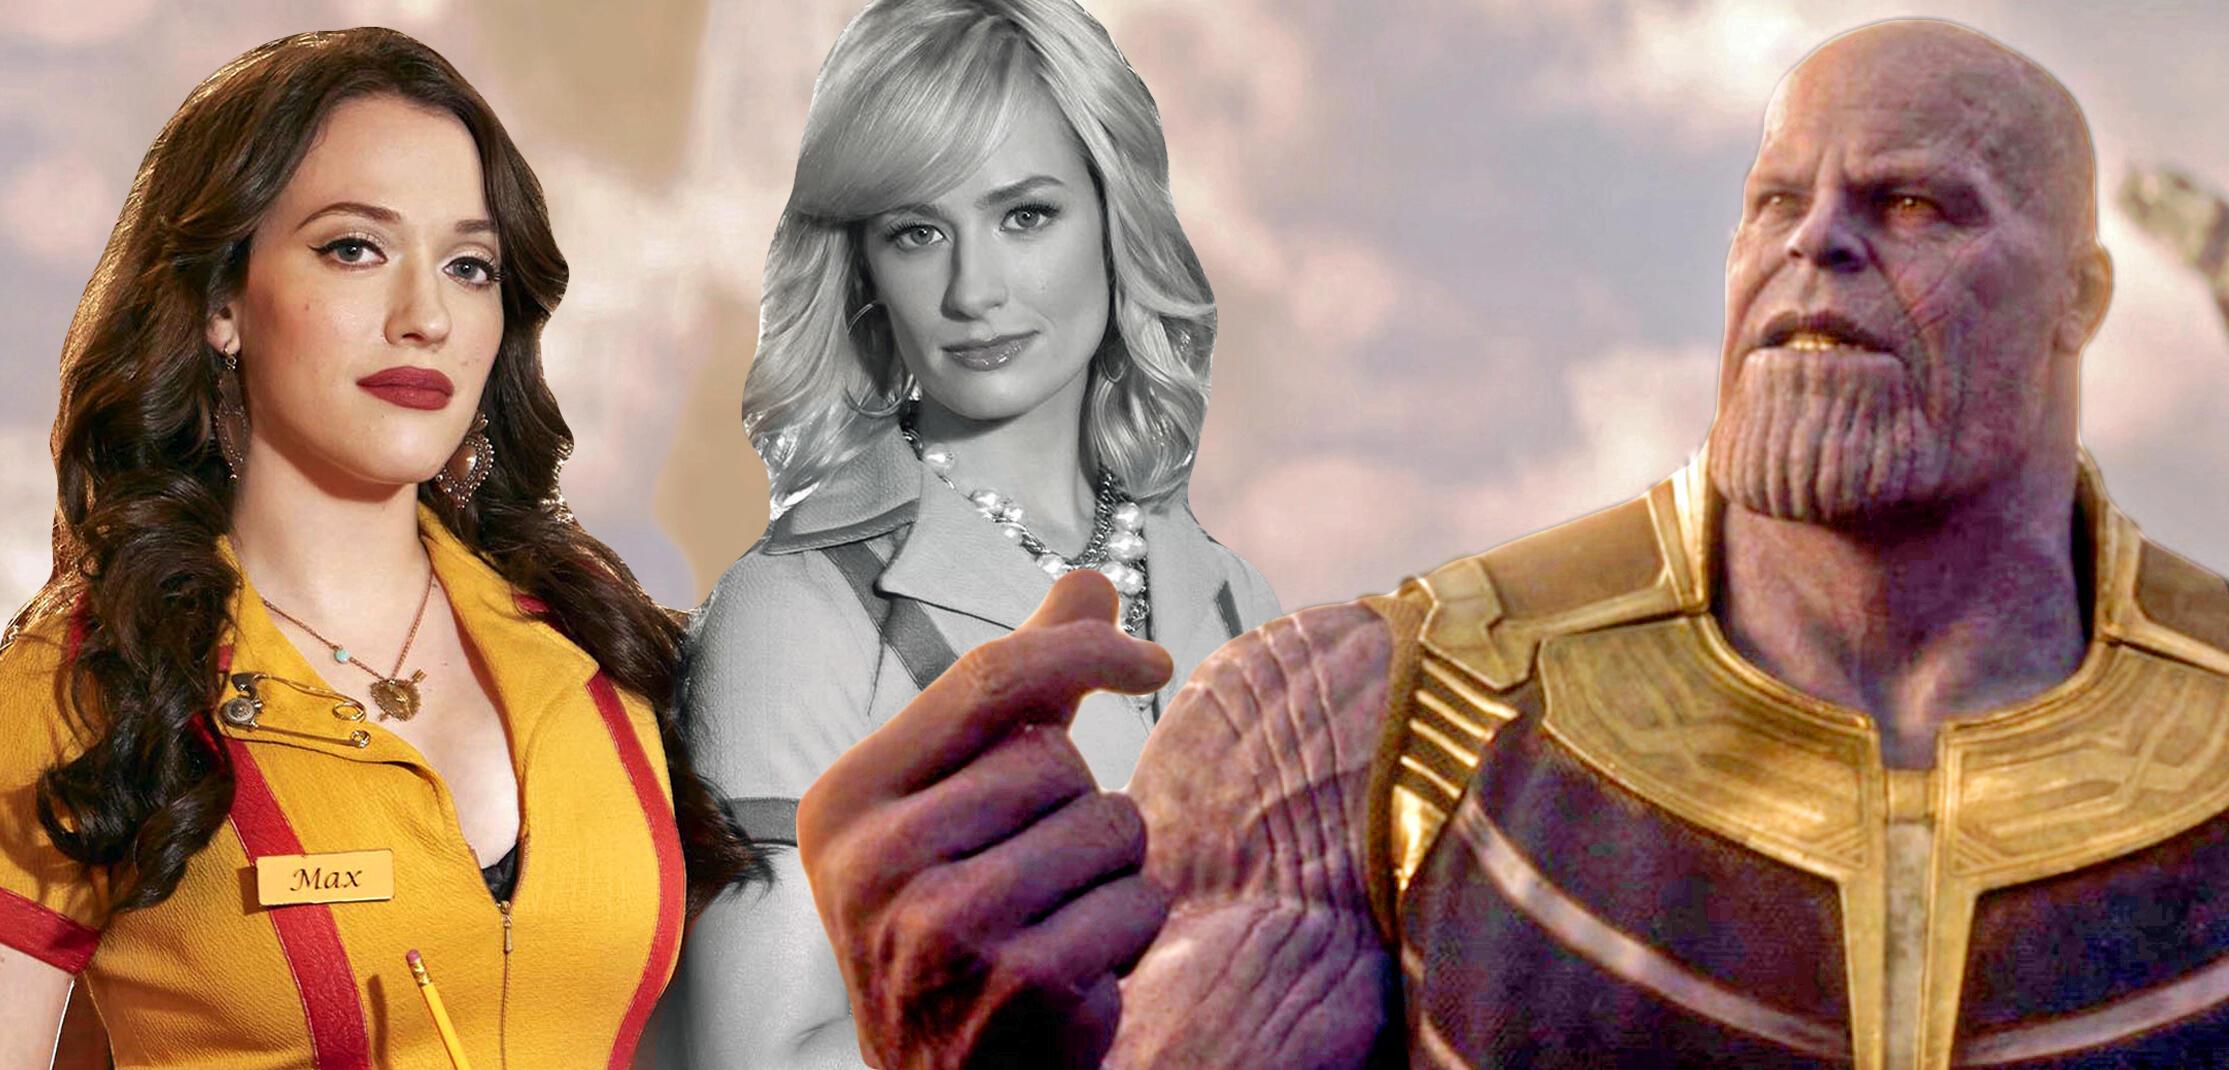 1 Broke Girl: Nennt uns eure Lieblingsserien nach Thanos' Schnipser